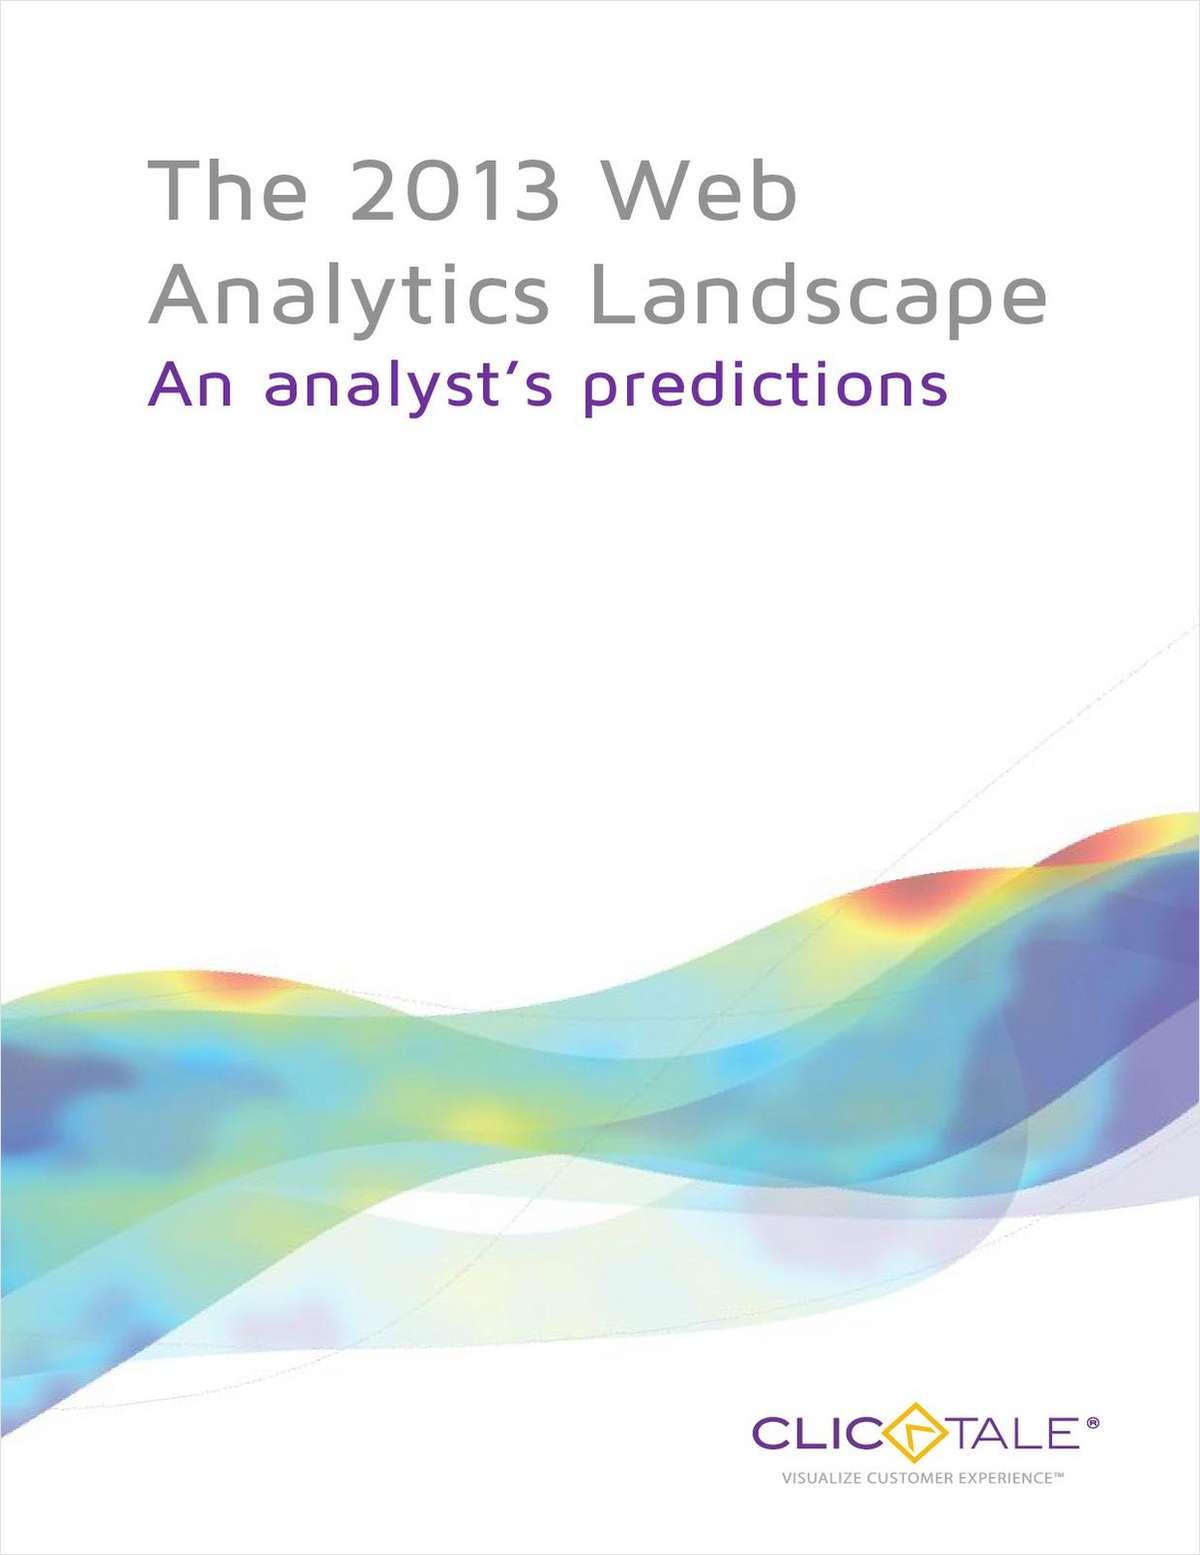 The 2013 Web Analytics Landscape